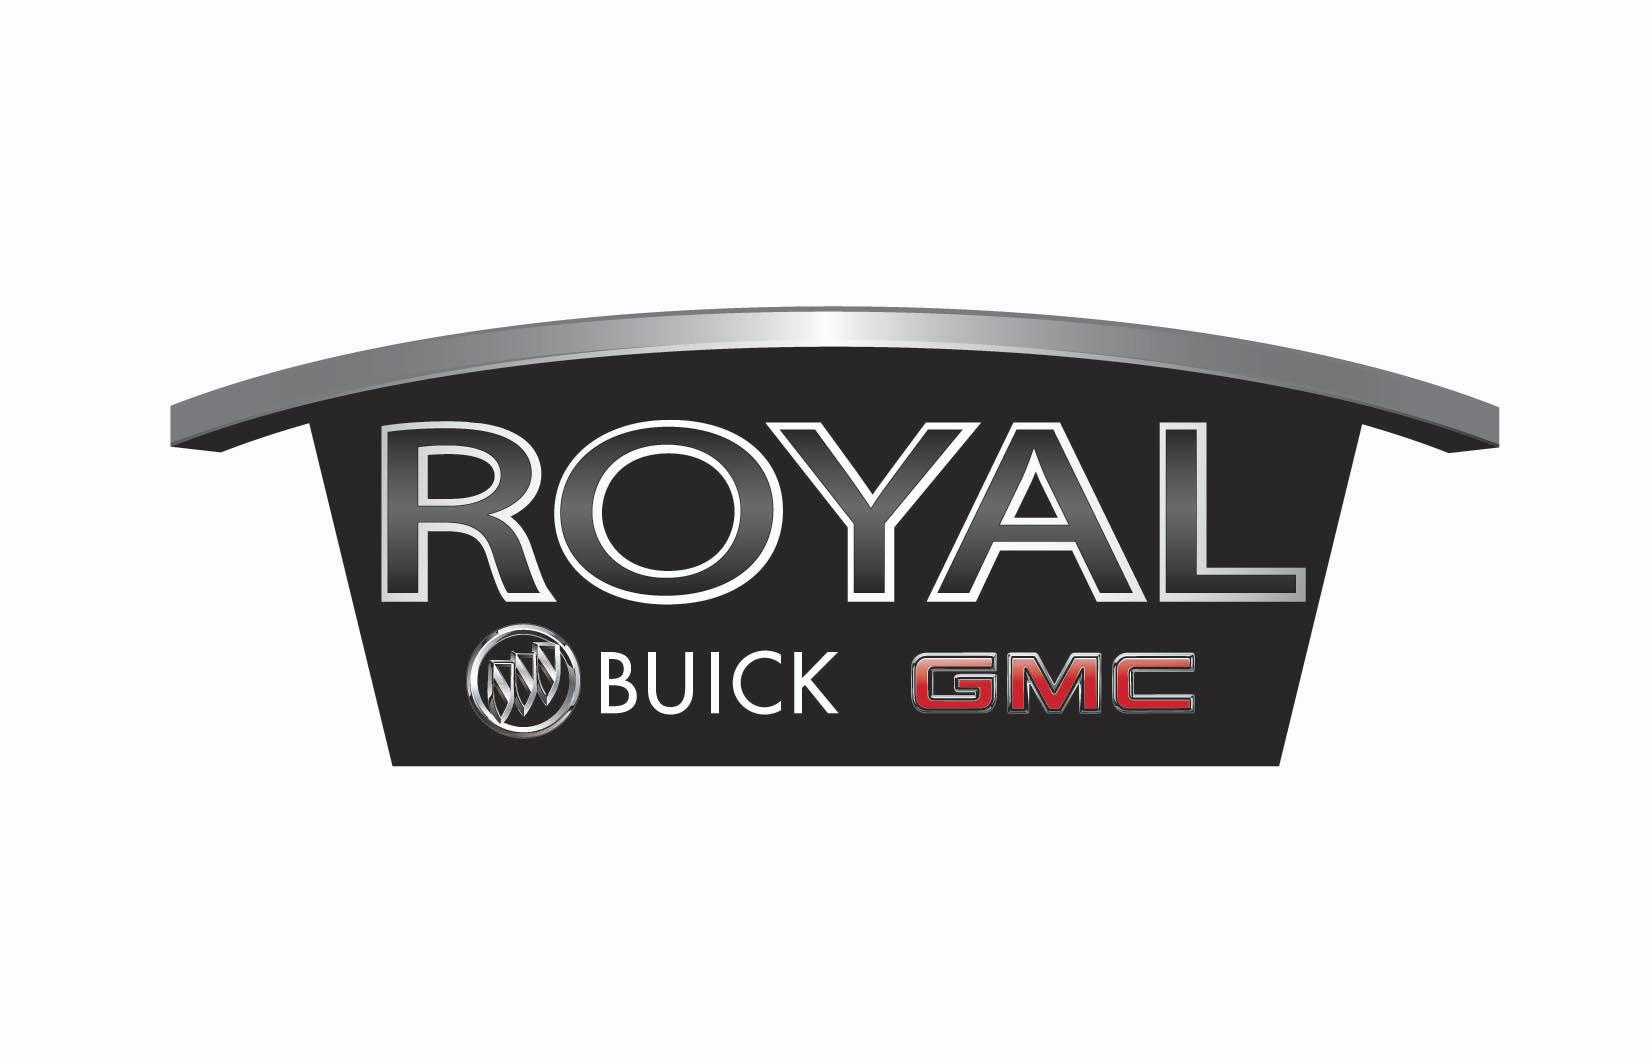 Royal Buick GMC, Sussex NJ